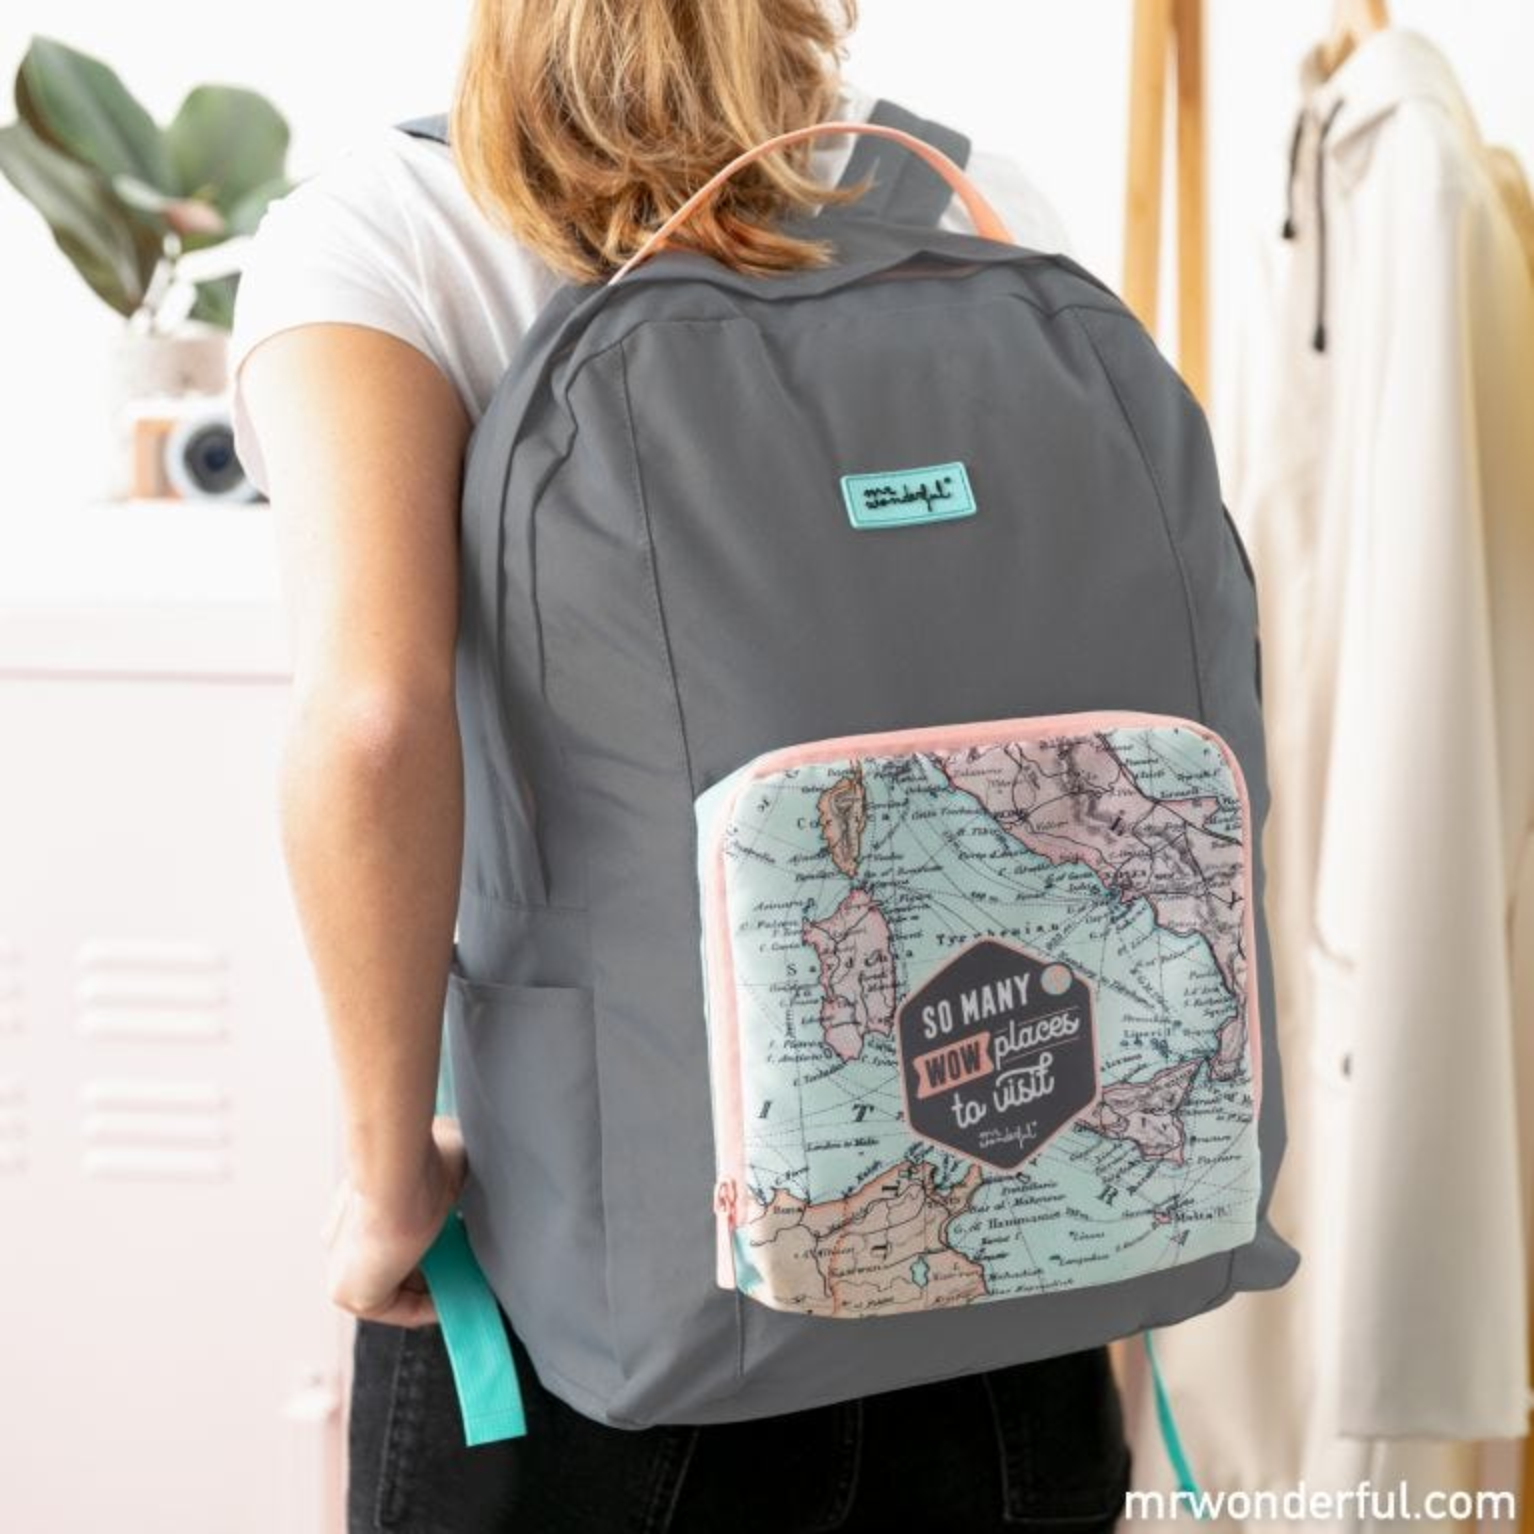 Foldable travel backpack - So many